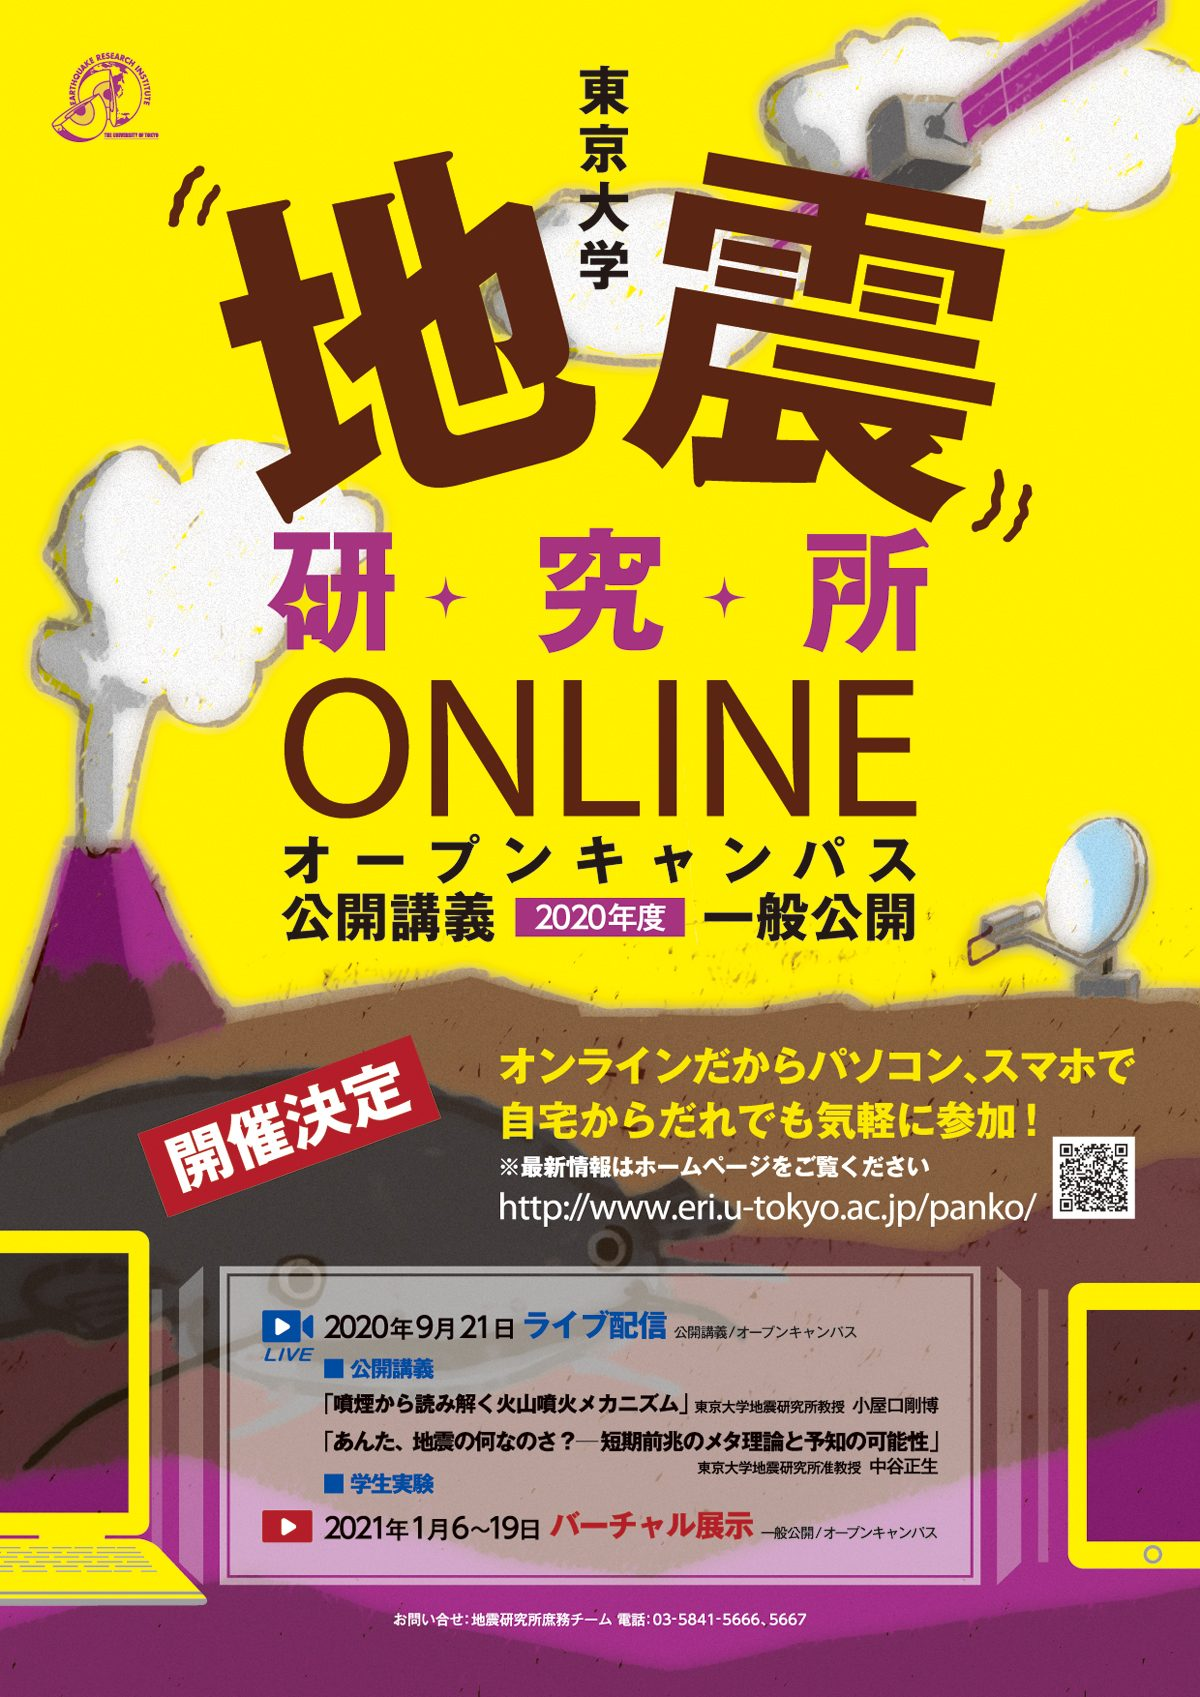 【2020年9月21日オンライン開催】地震研究所一般公開・公開講義